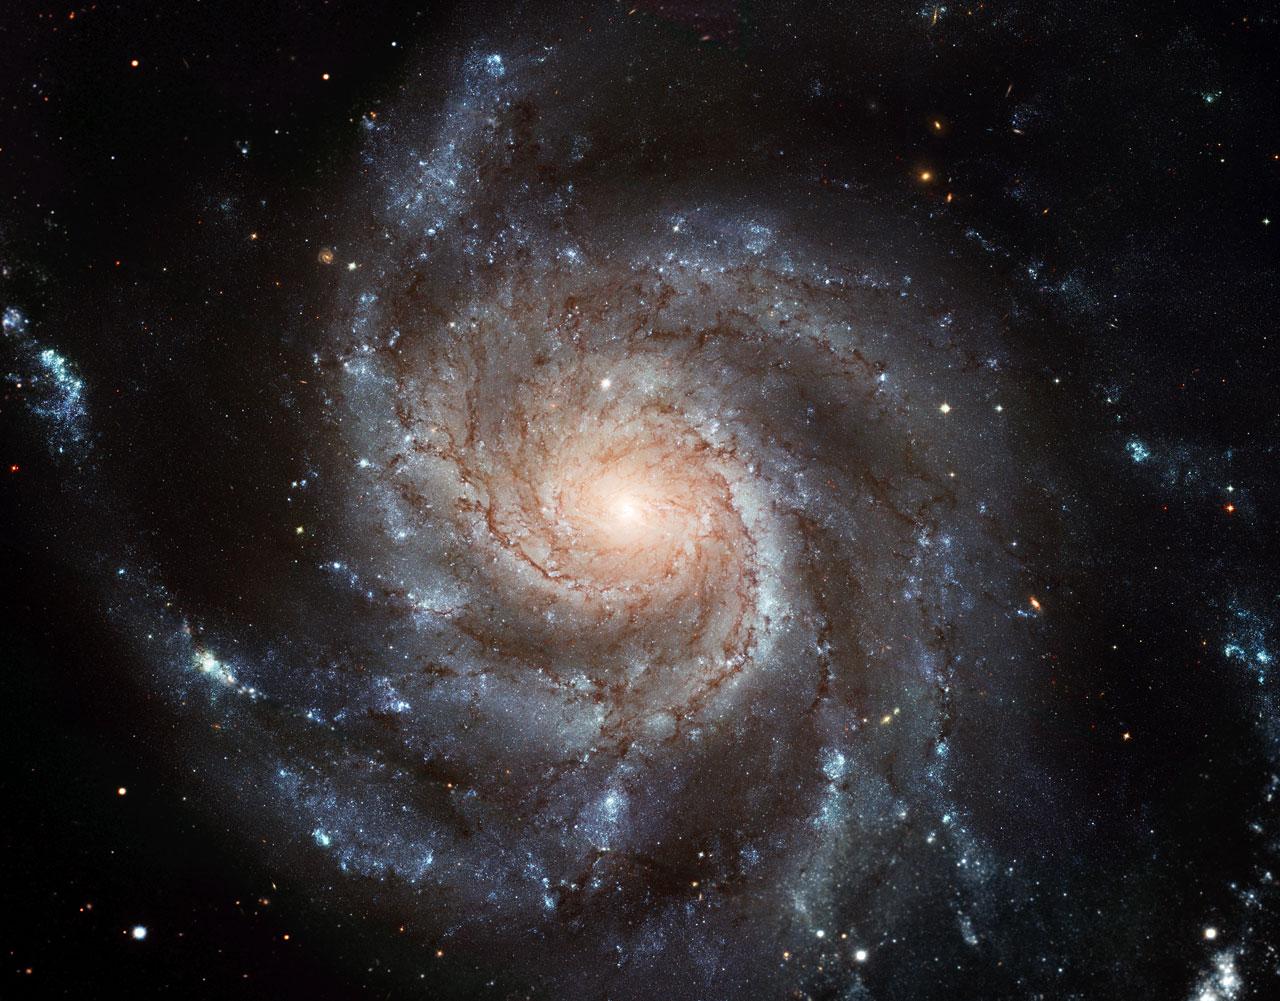 Largest Ever Galaxy Portrait Stunning Hd Image Of Pinwheel